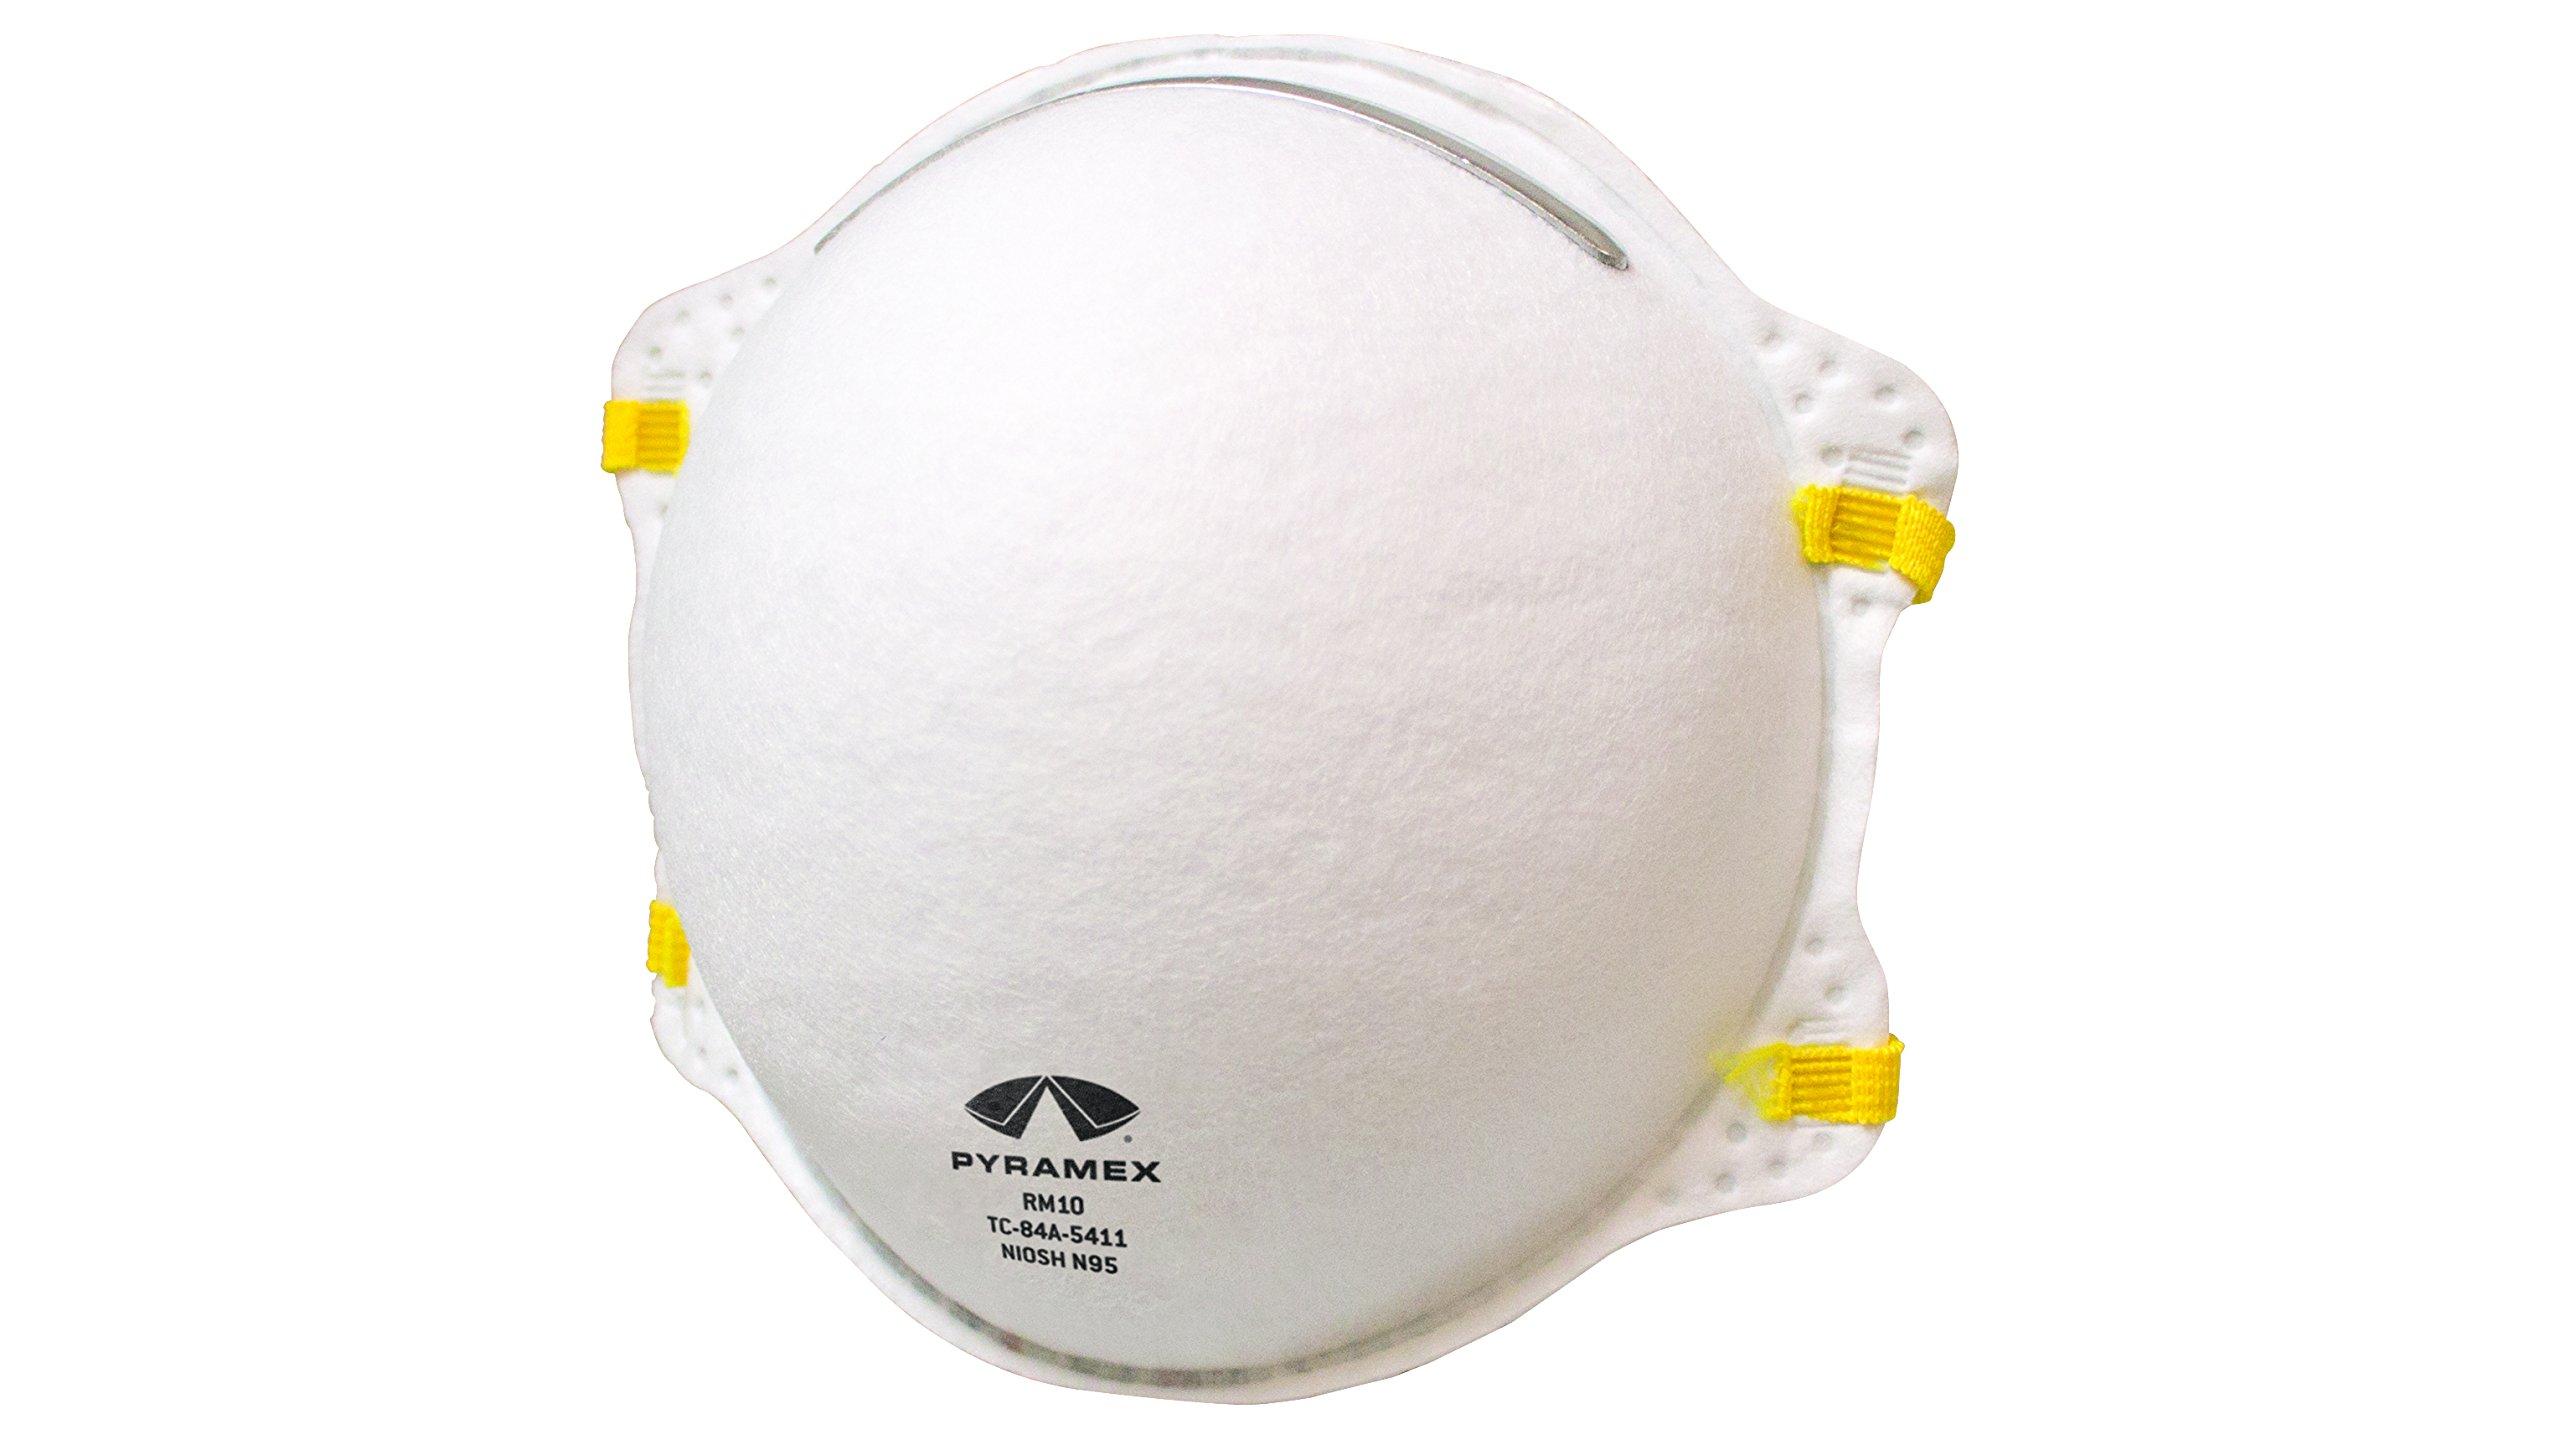 Pyramex RM10 N95 Particulate Dust Masks -Cone Respirator Masks (20 Pack)